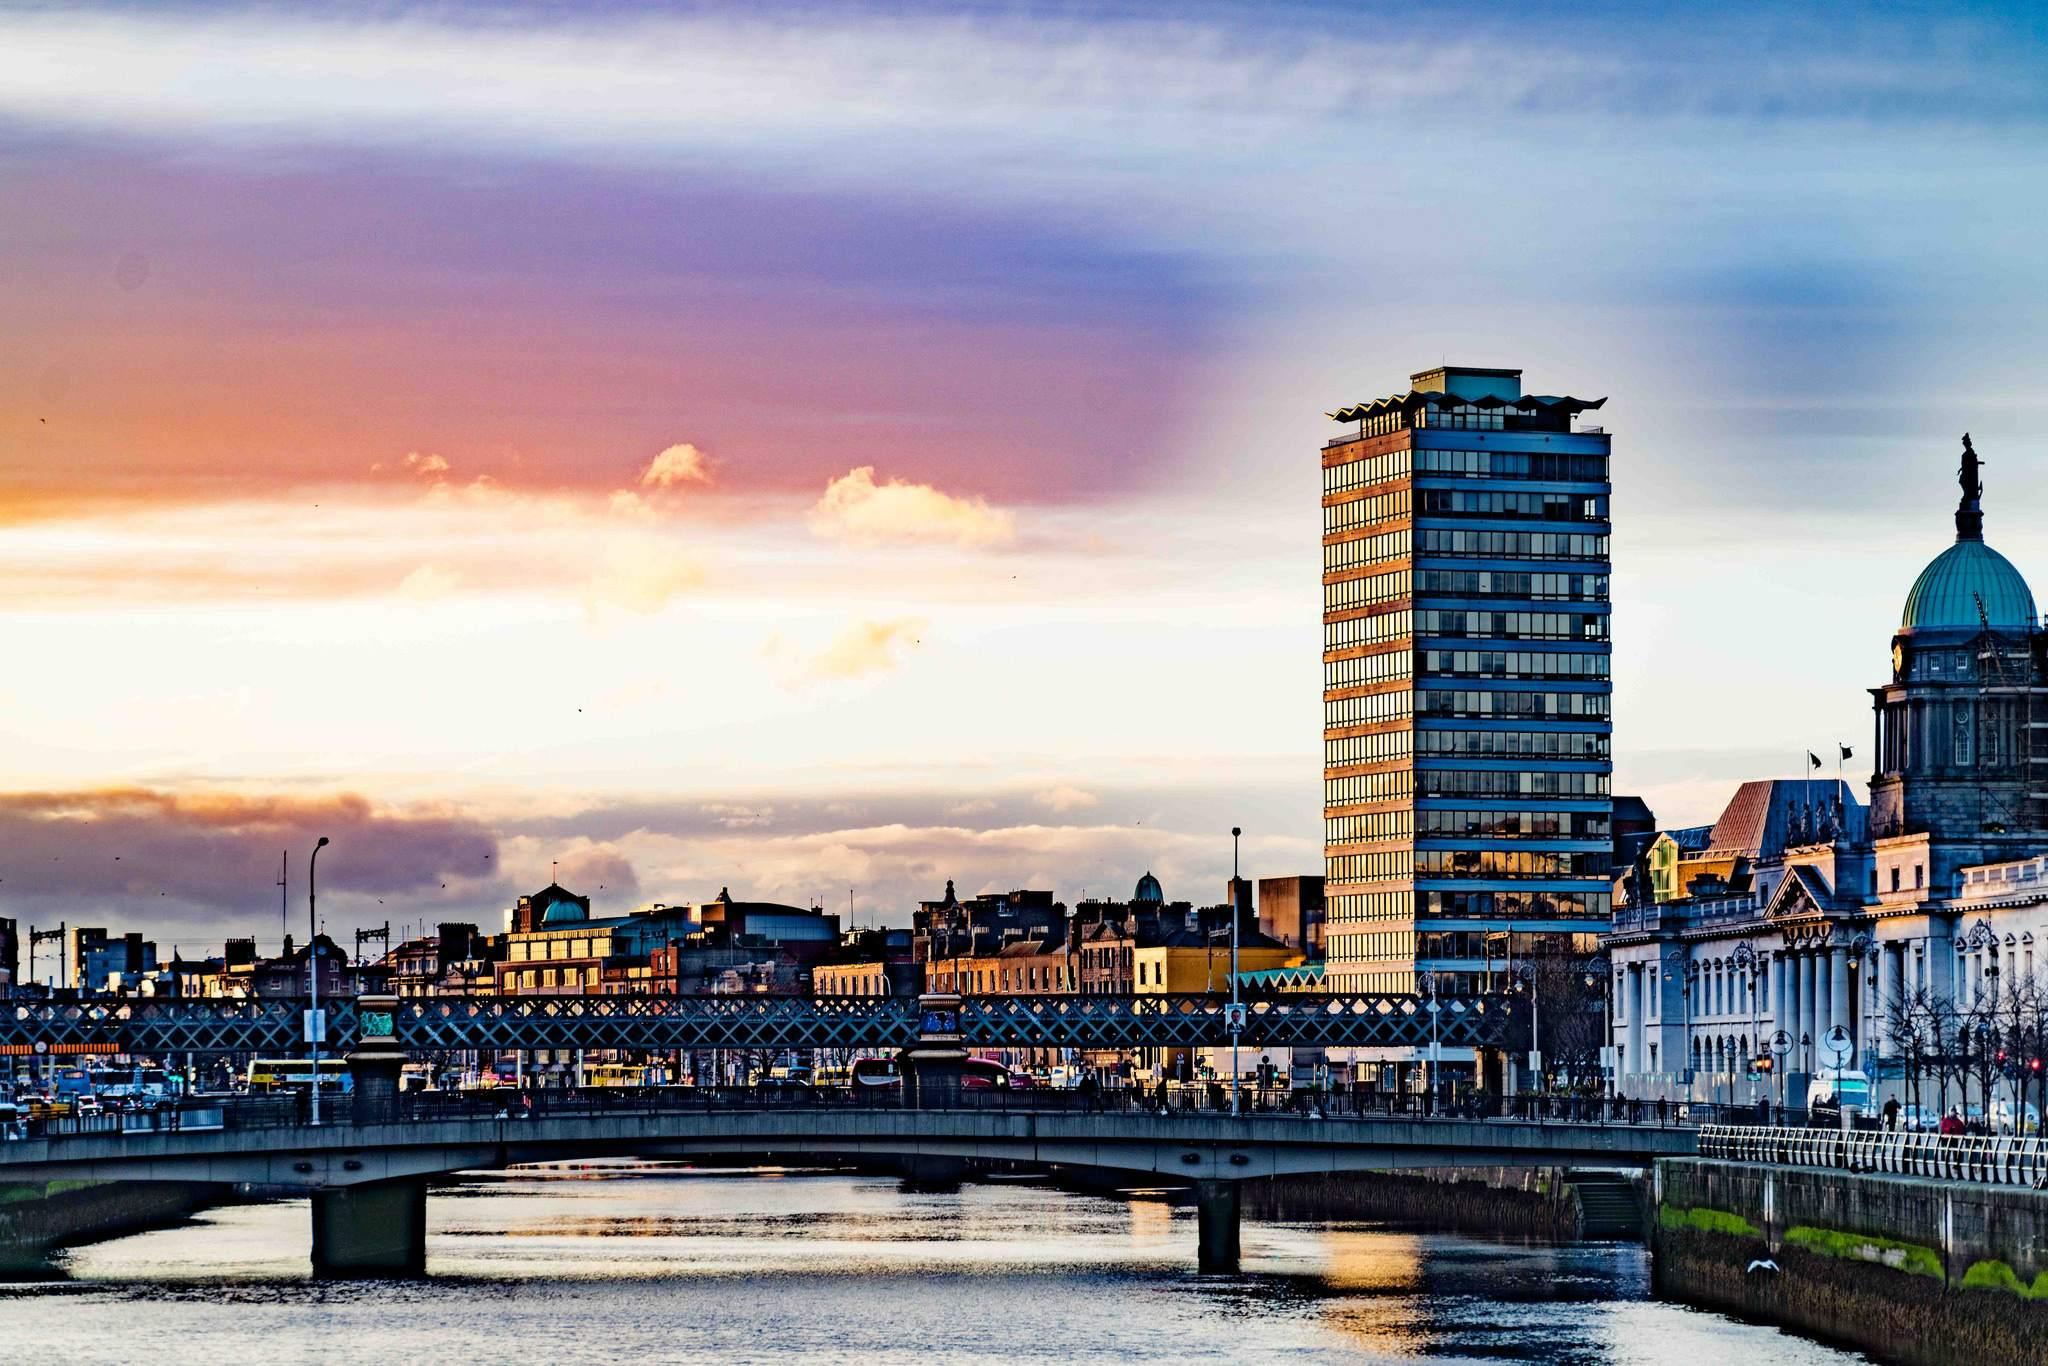 dublin docklands3 Walking Around Dublin Docklands by Marphy